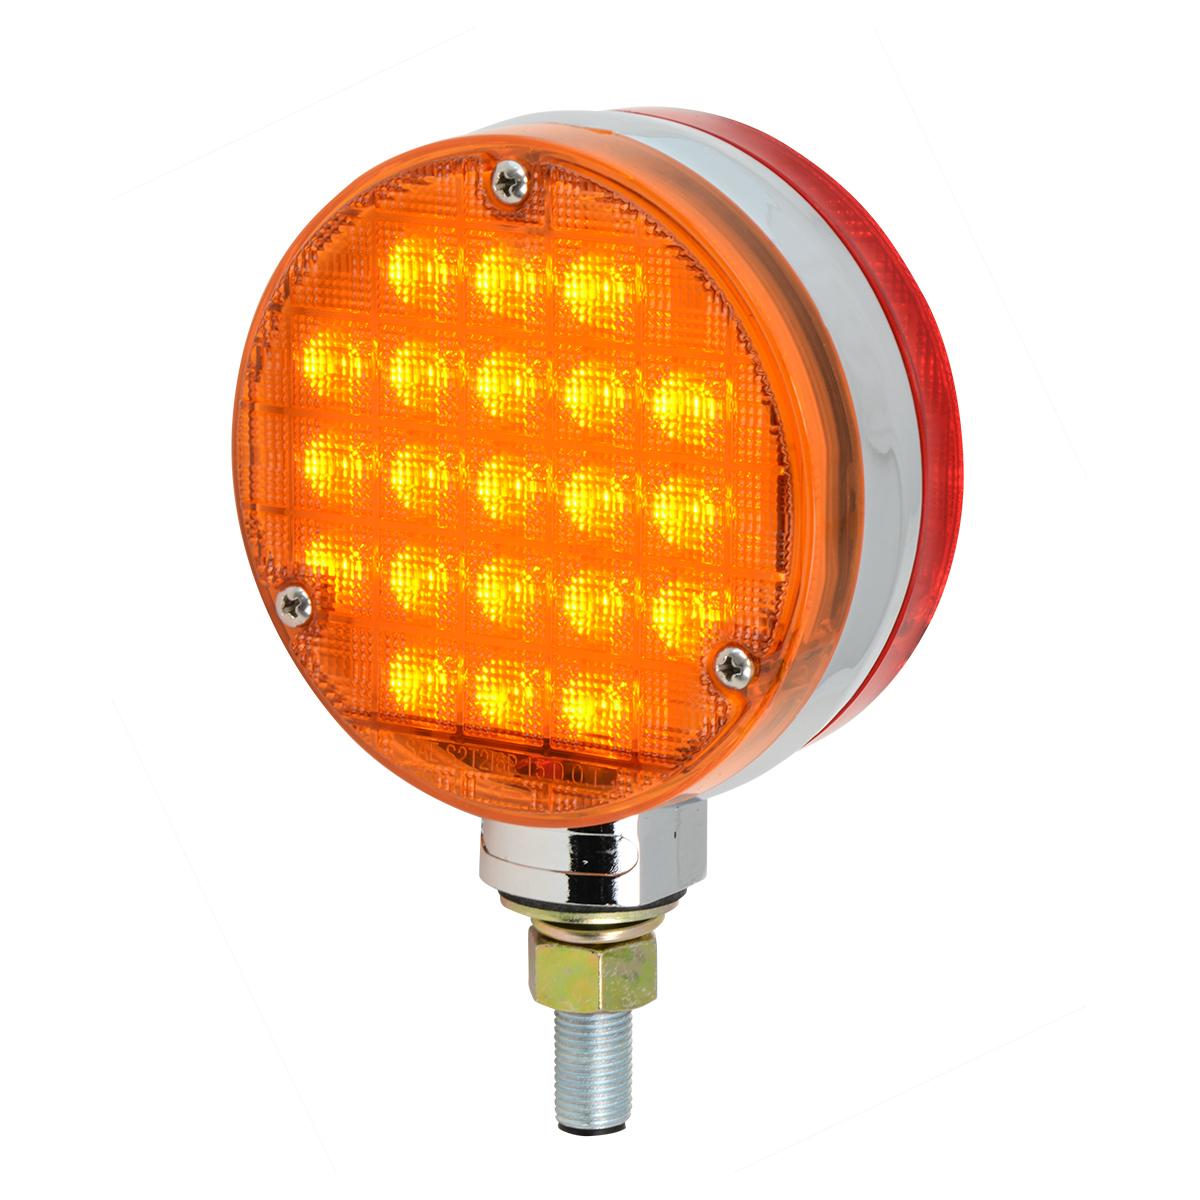 "4"" Double Face Smart Dynamic LED Pedestal Light in Color Lens"